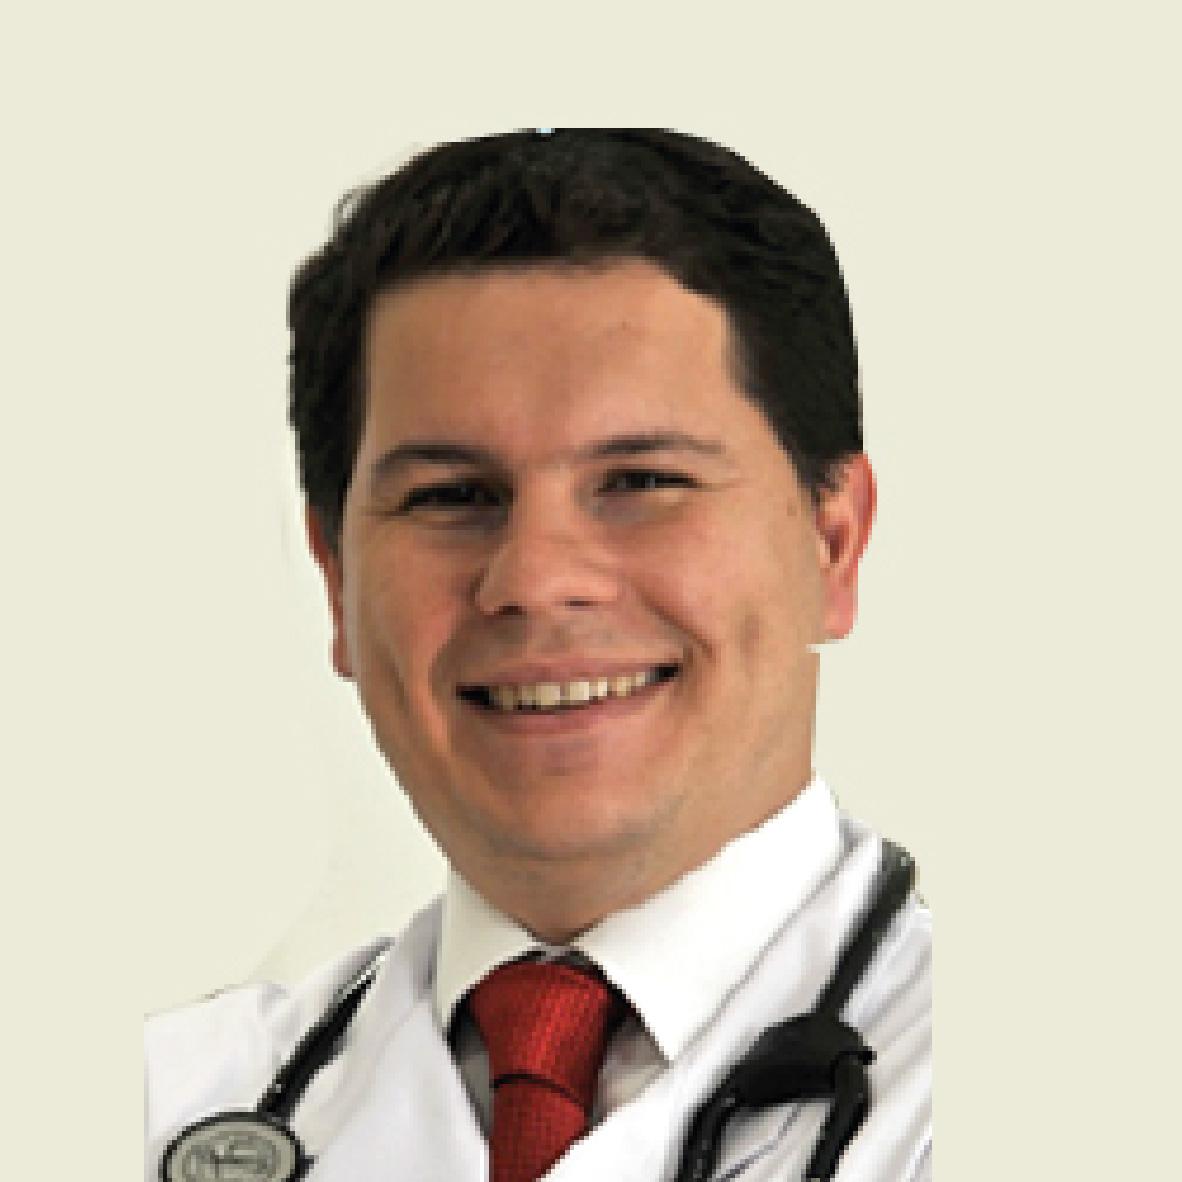 Rodrigo Santucci